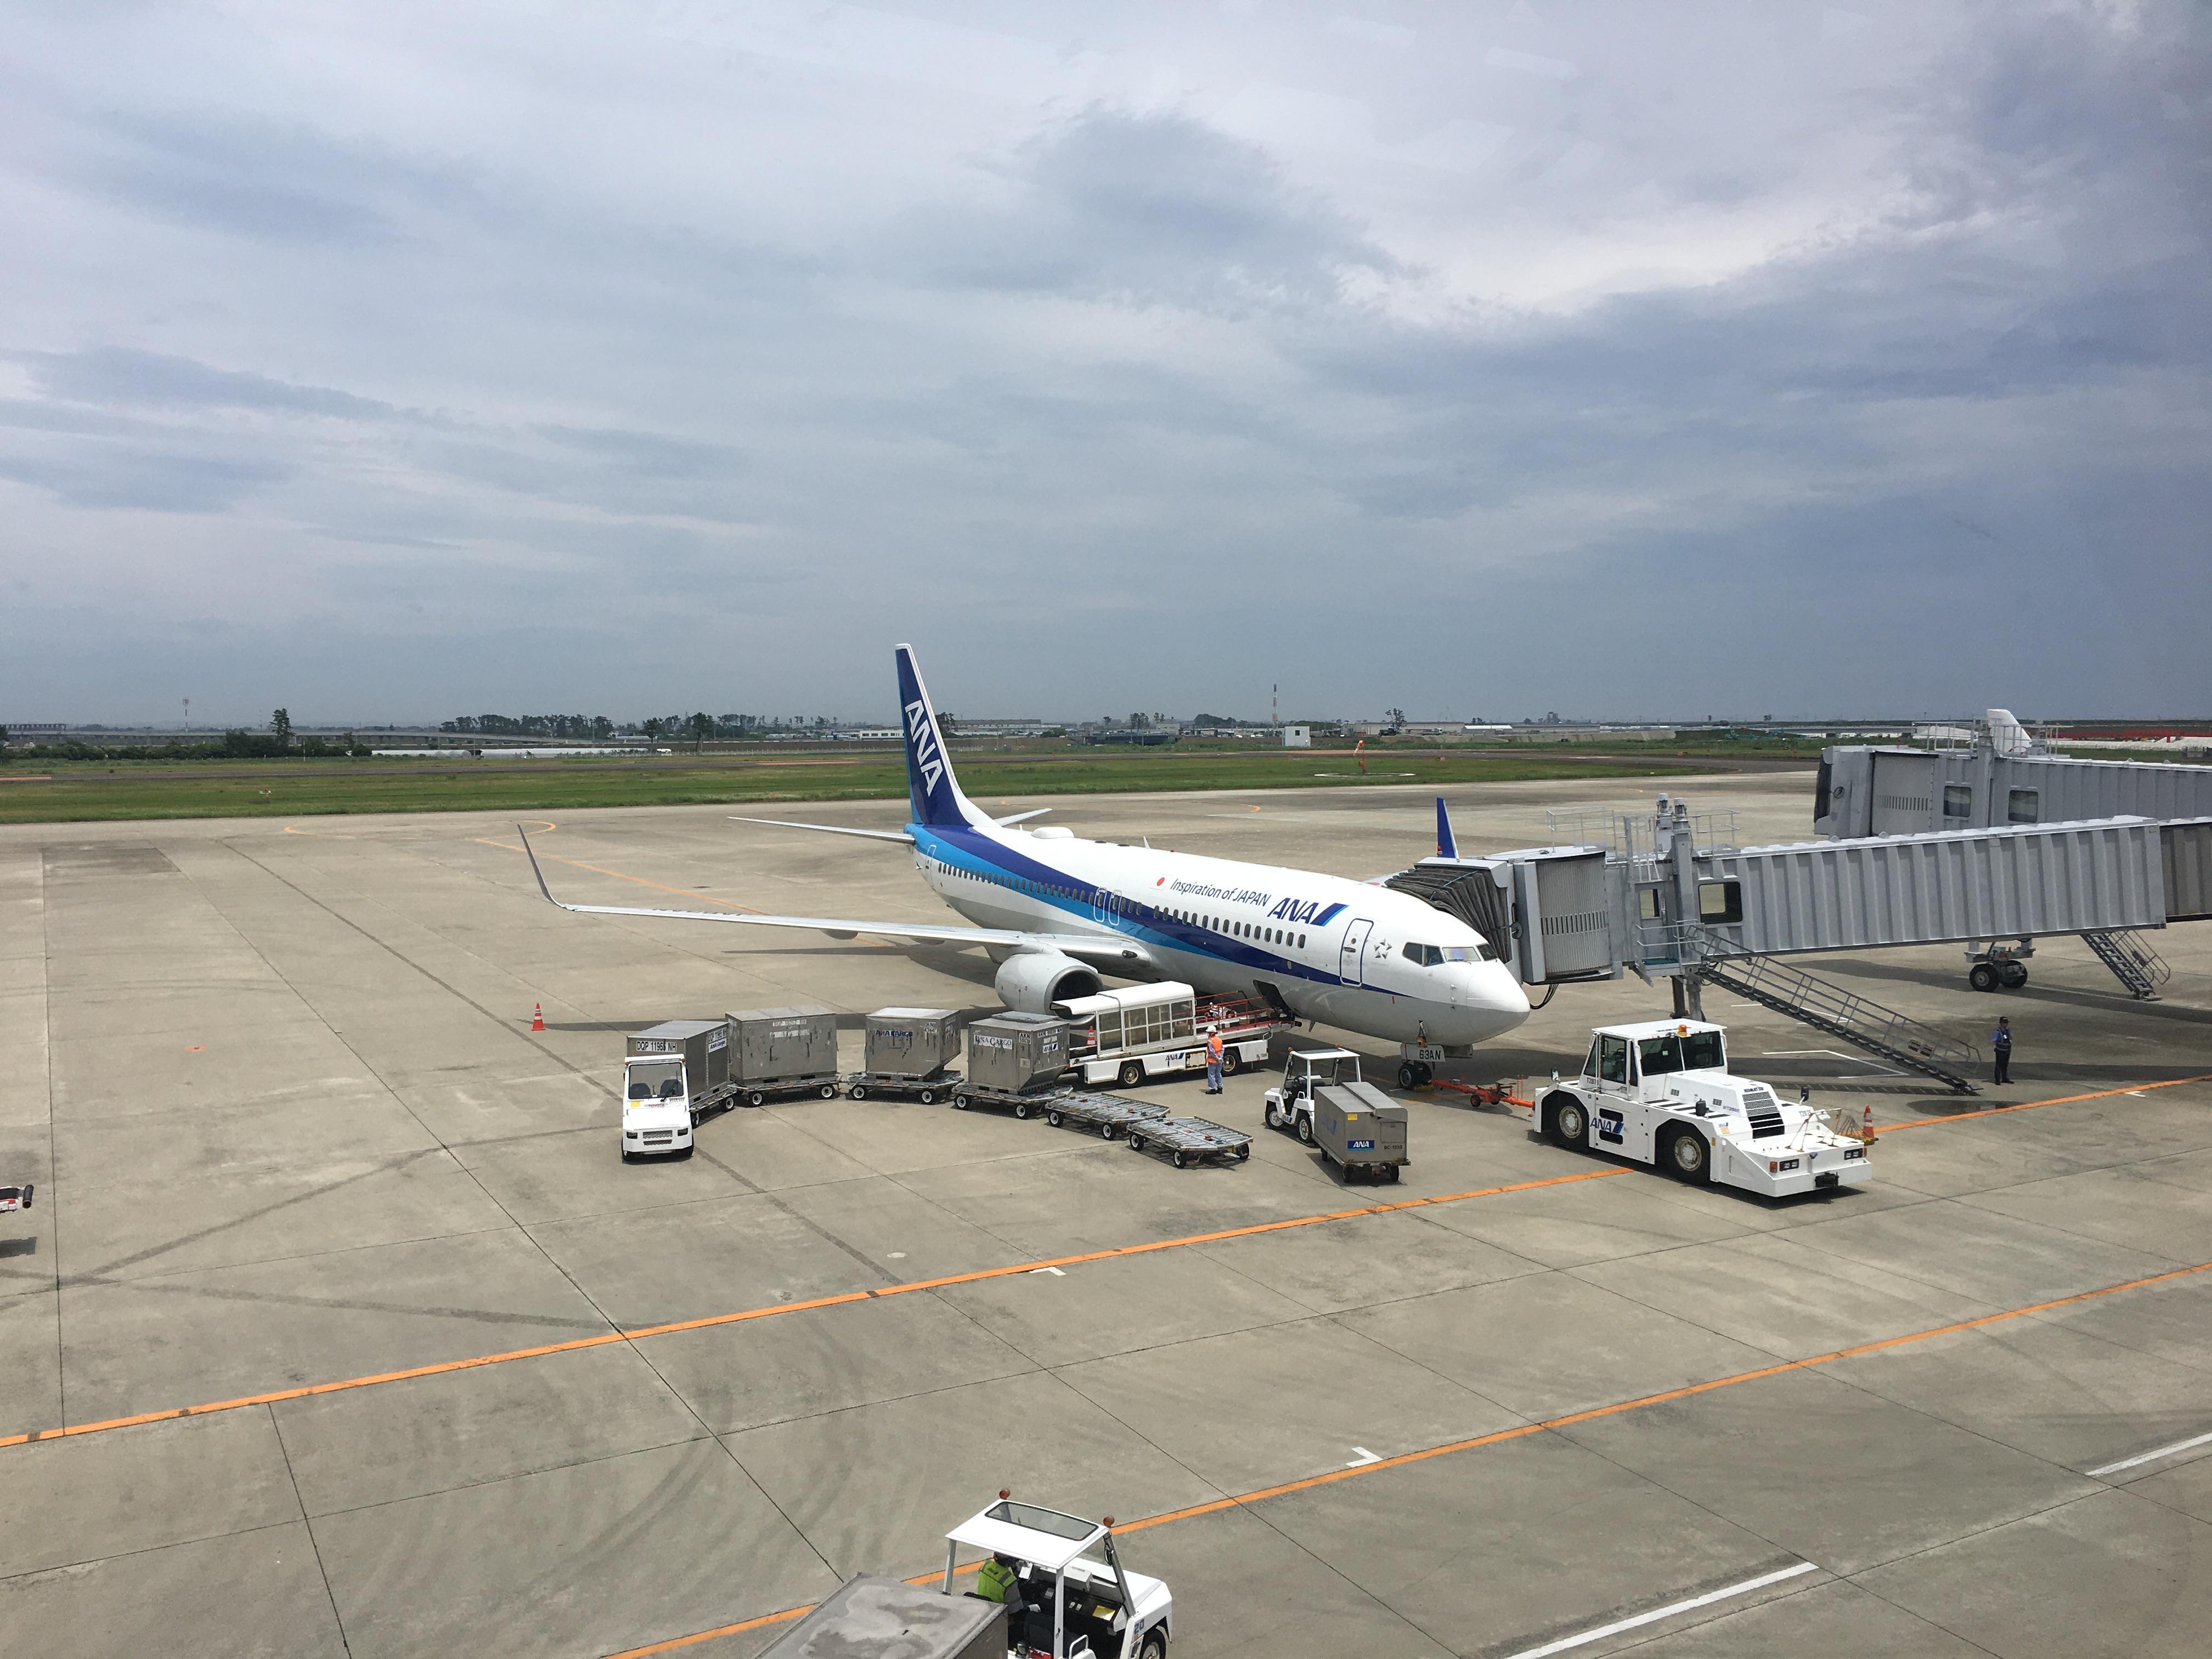 全日空(NH) NH1863(仙台(SDJ) – 那覇(OKA))のWifiスピードチェック